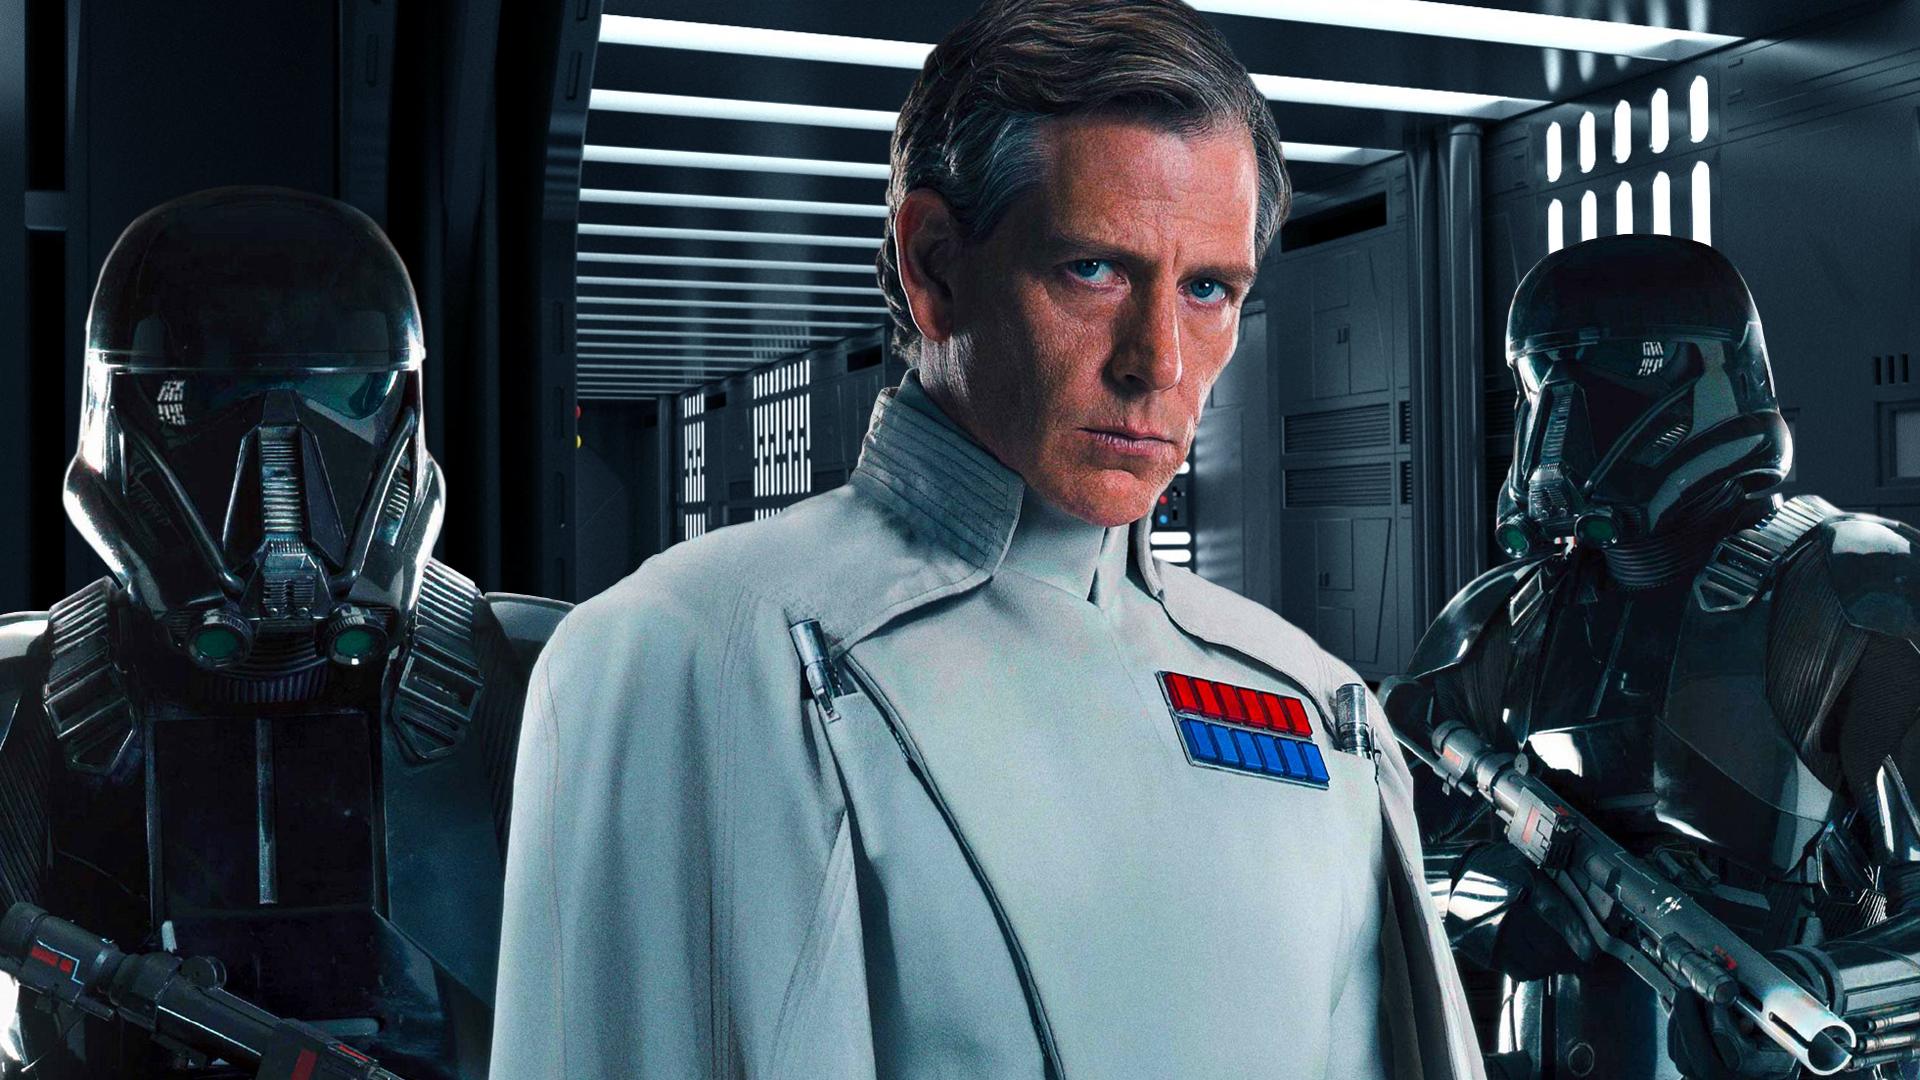 Star Wars Floor Plans Rogue One Empire Magazine Wallpaper 1 Krennic By Spirit